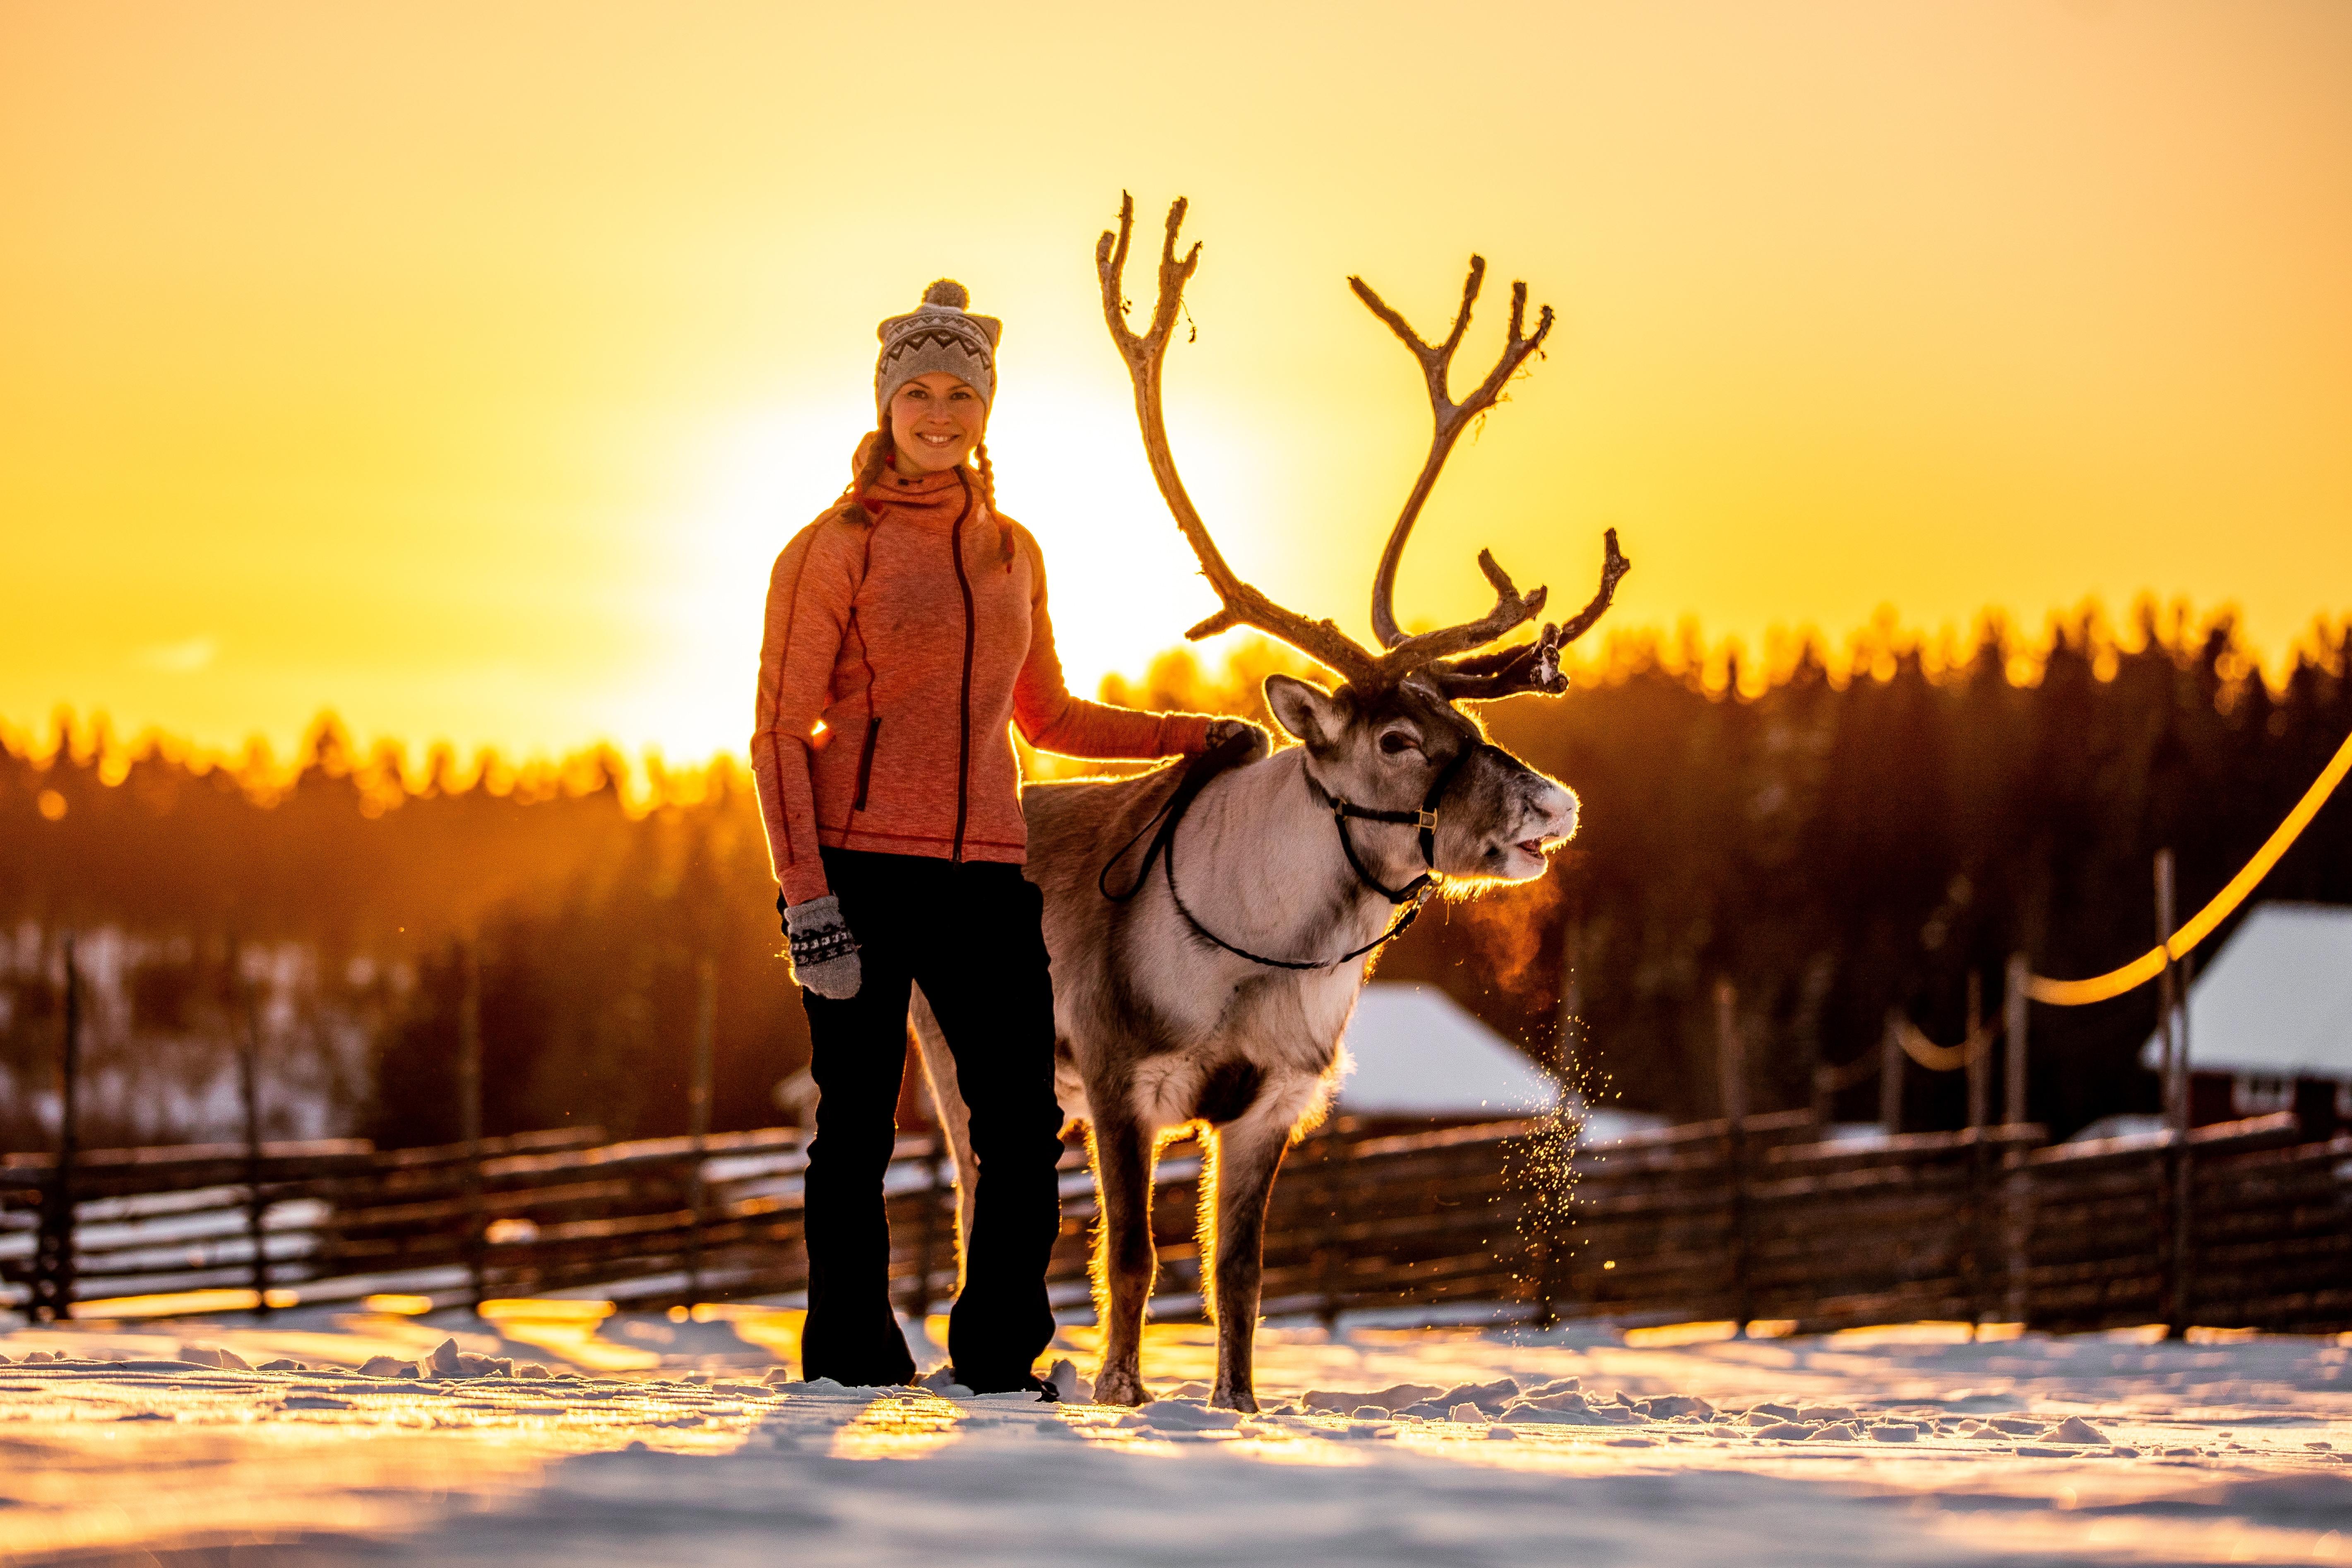 vide- ullis-rudolf-renranchen-renar-reindeer